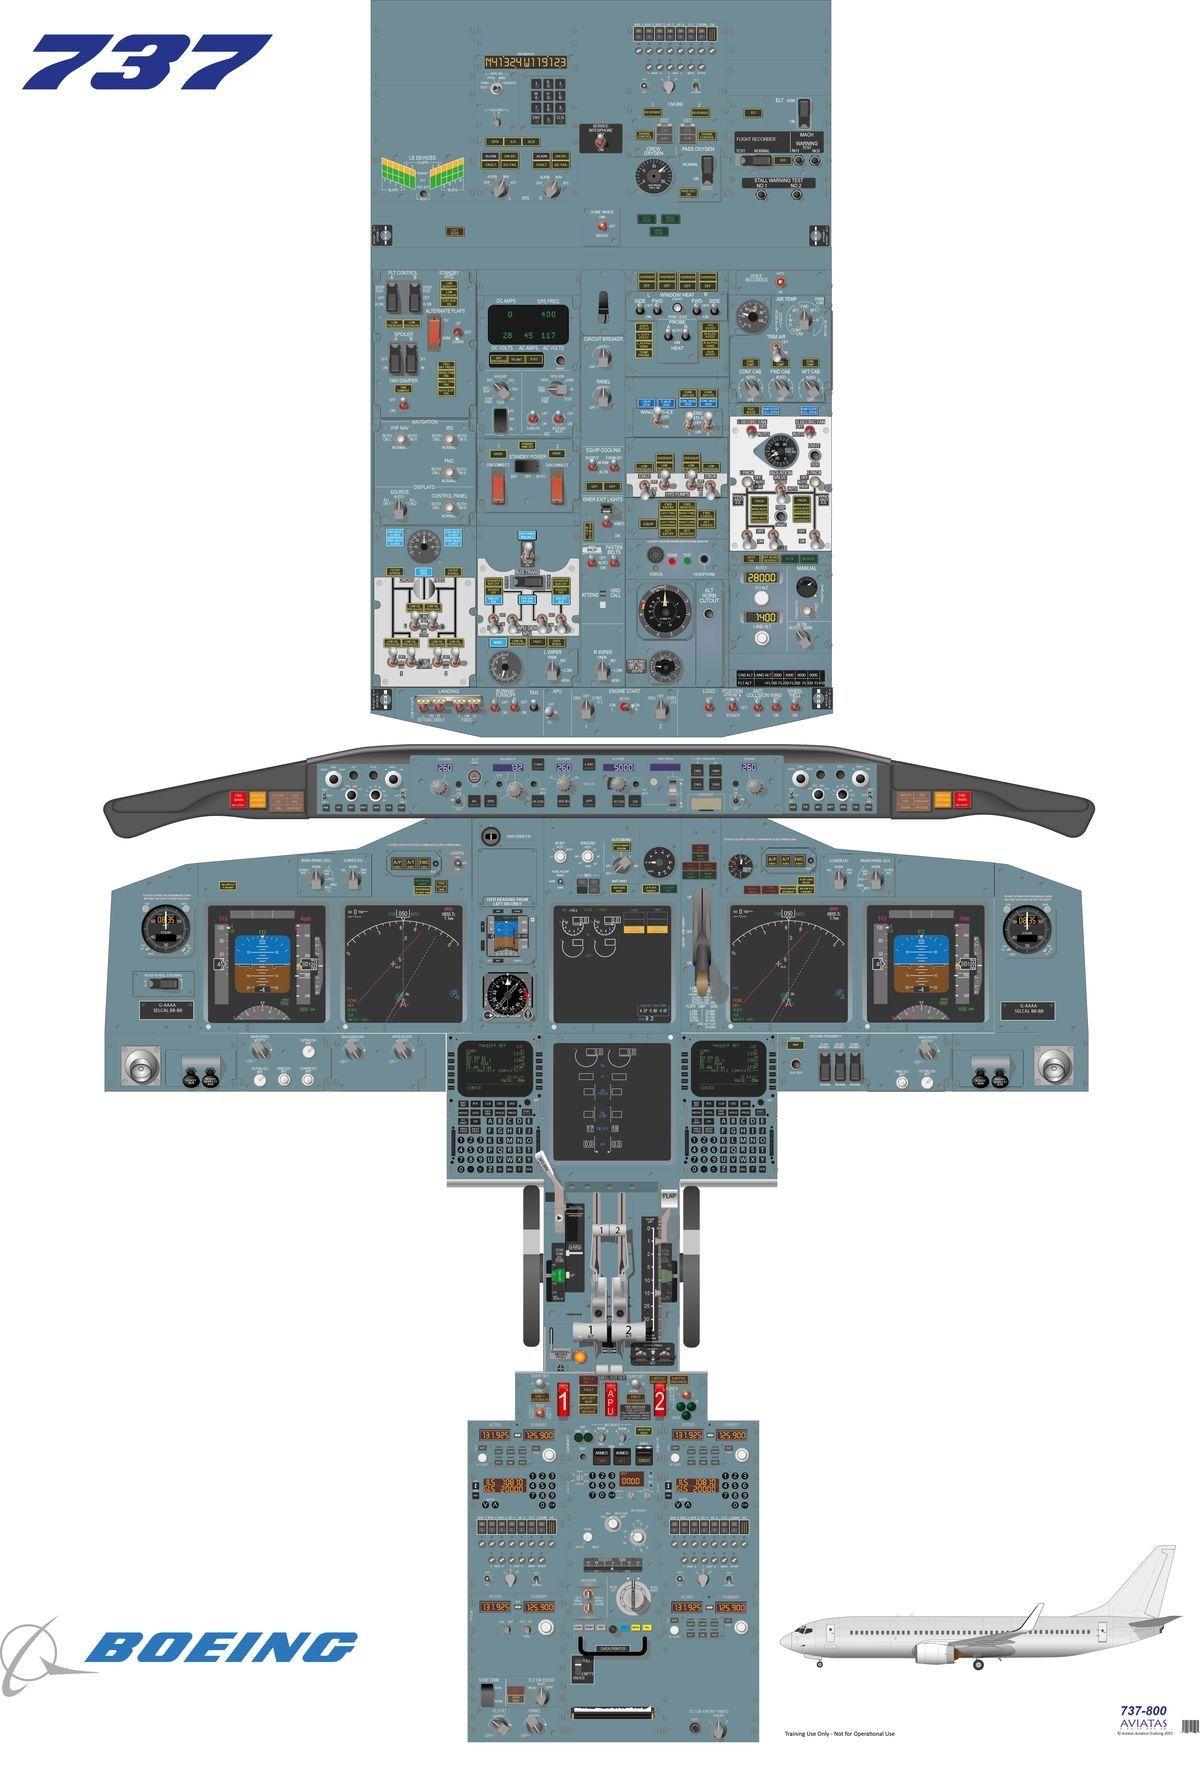 Aircraft Carrier Diagram Husky Air Compressor Wiring Flight Deck Free For You Boeing 737 800 Cockpit Used Training Pilots Rh Pinterest Com Diorama